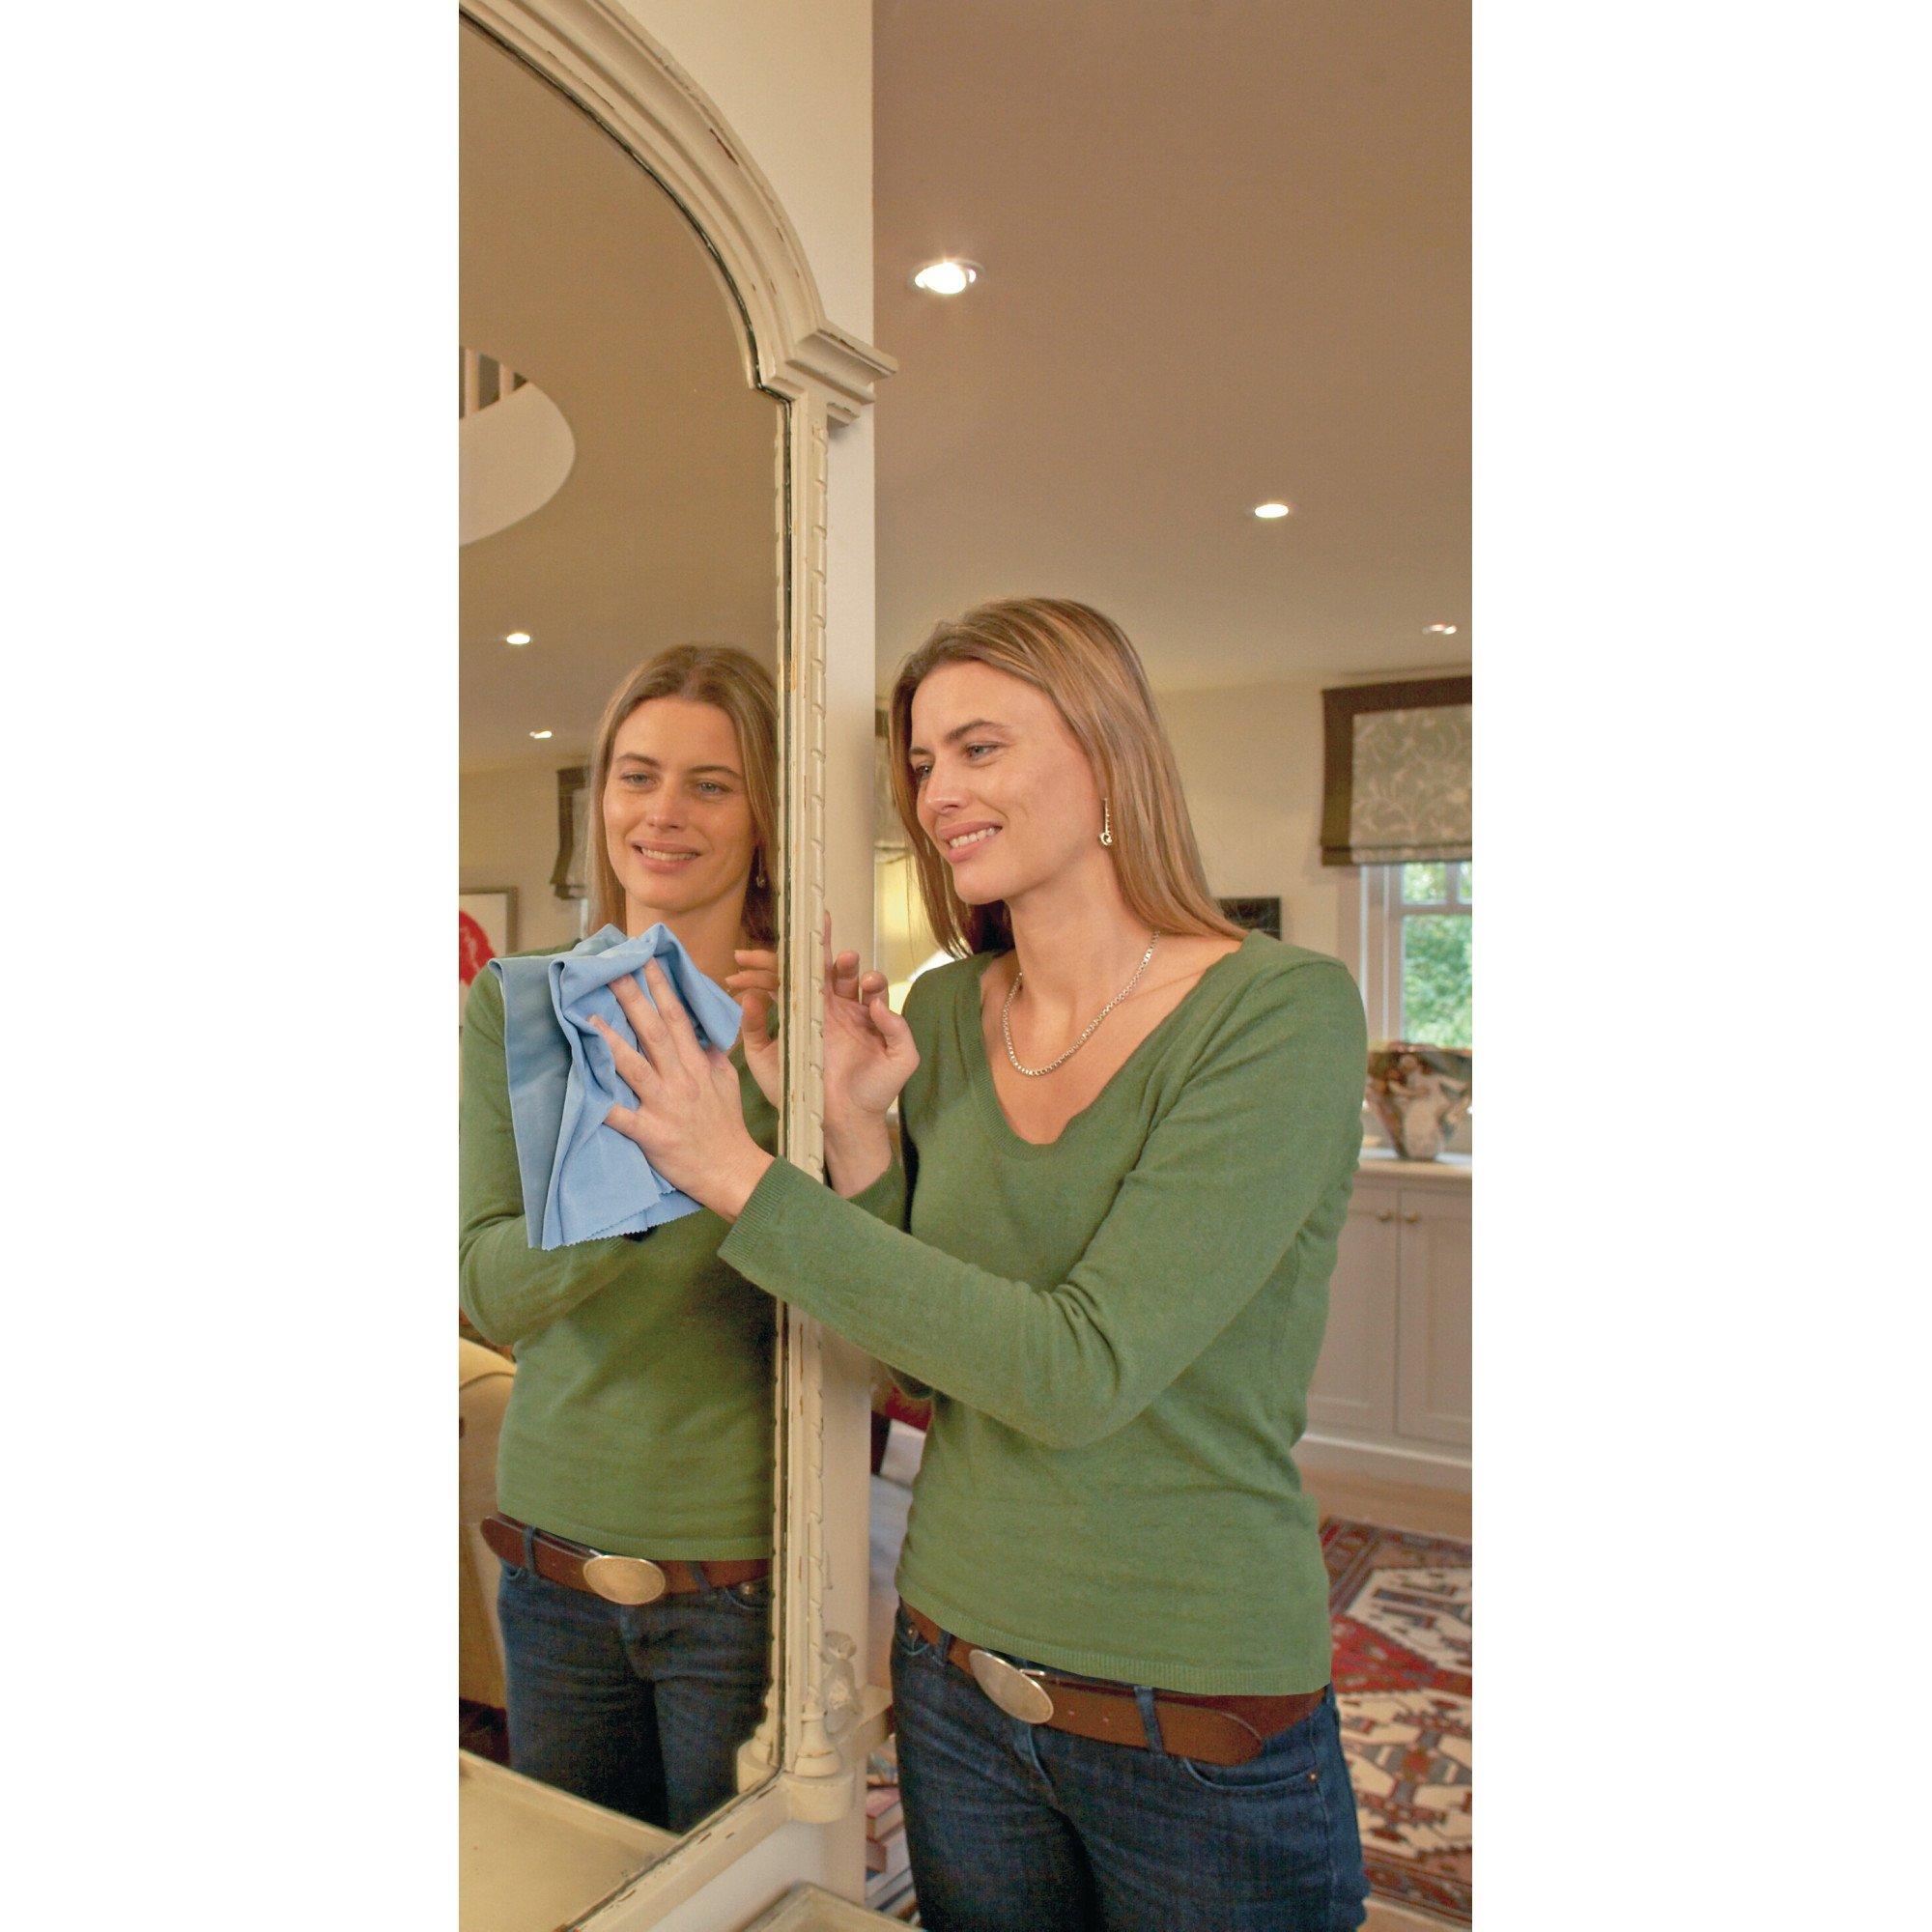 Glass & Polishing Cloth - Brilliant for Sparkling Windows, Mirrors, Glassware, Chrome, and More by E-Cloth (Image #20)